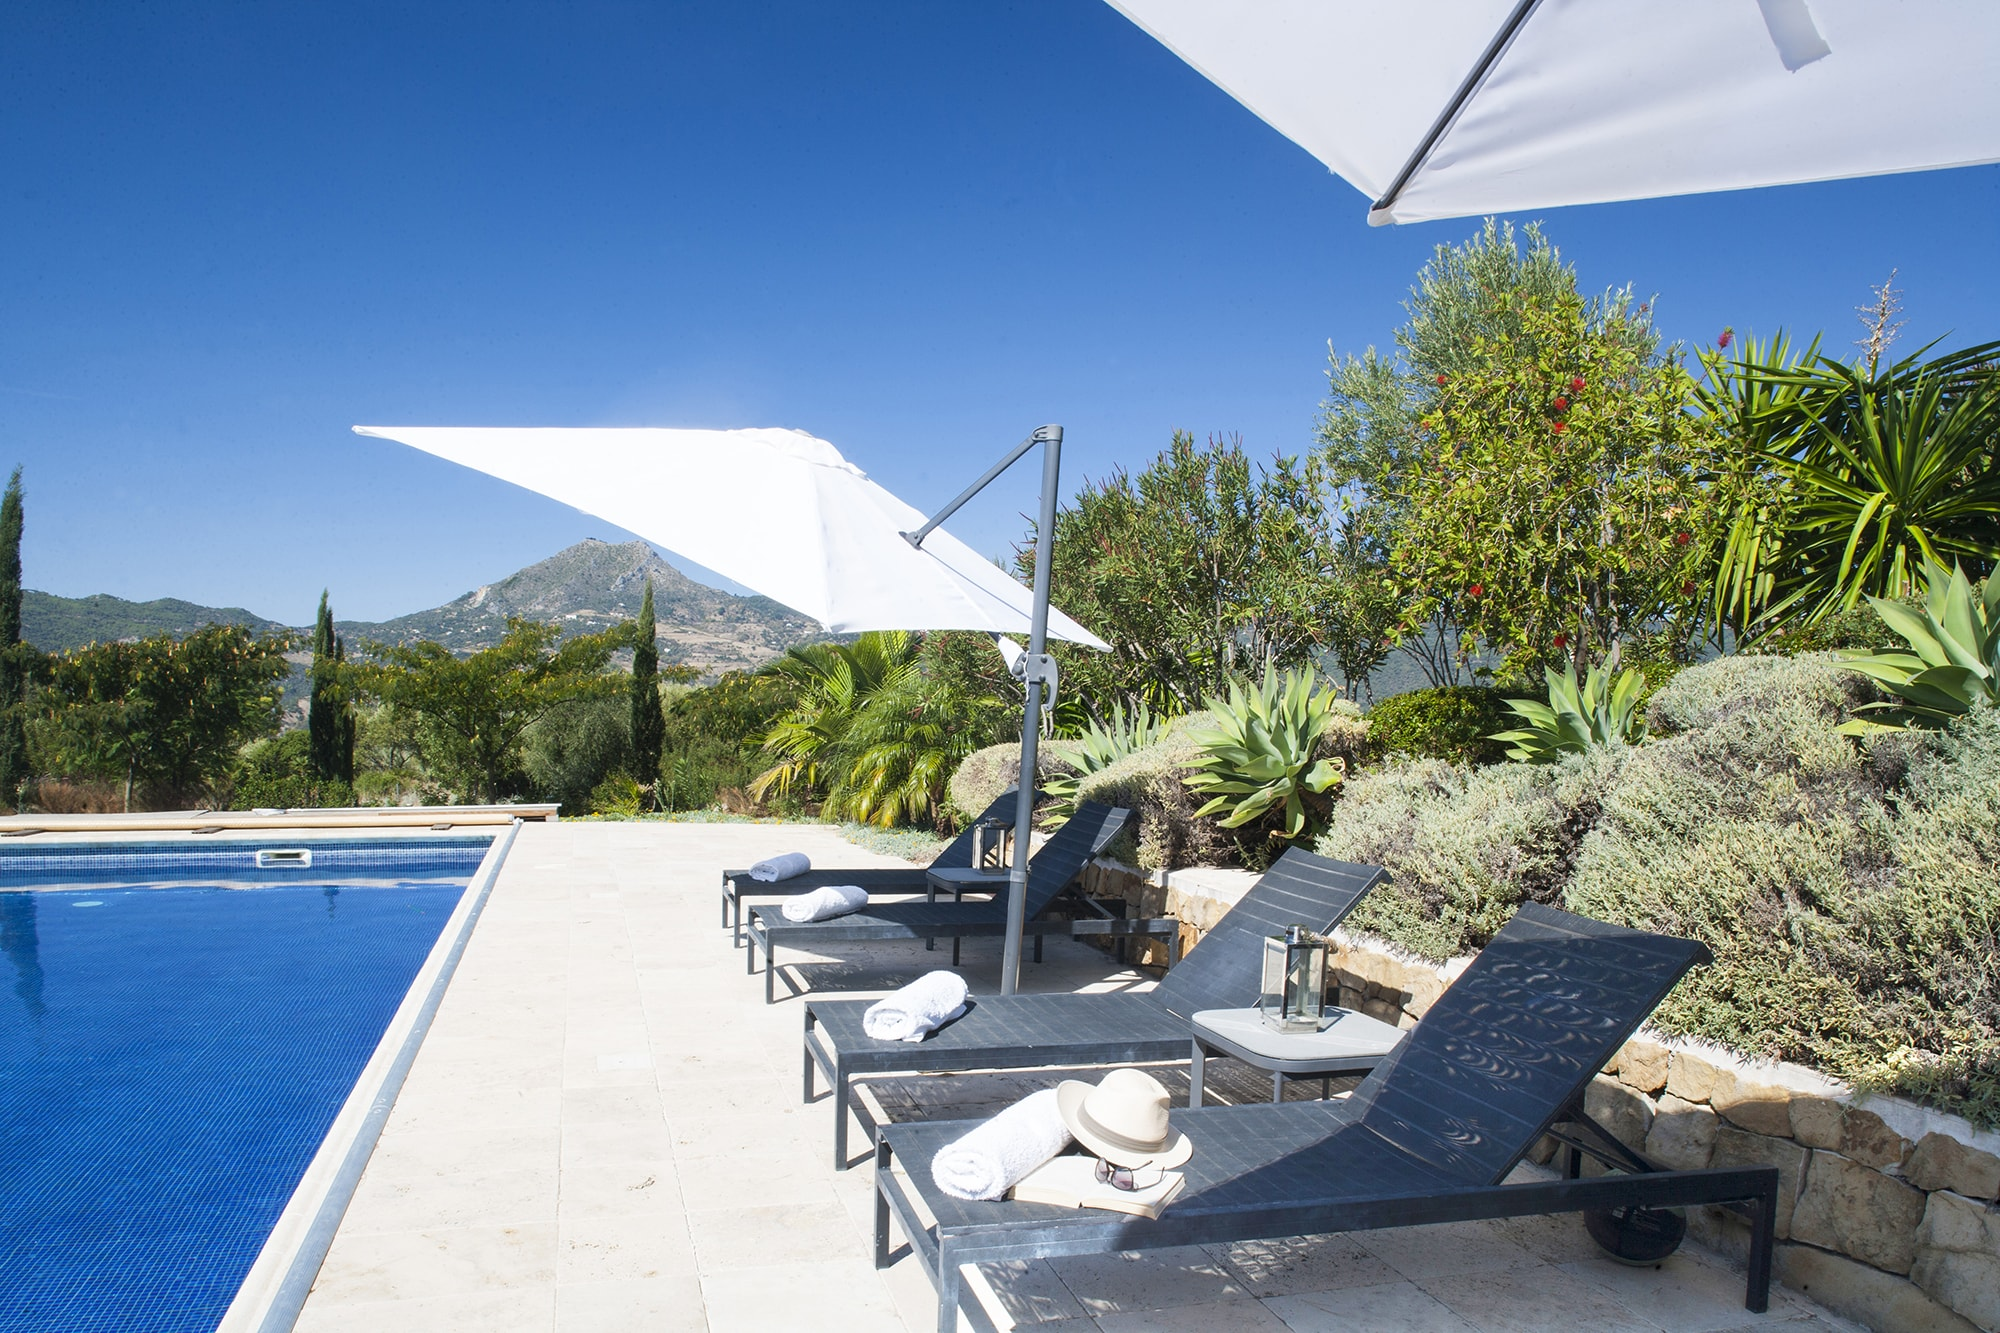 sun beds and umbrellas